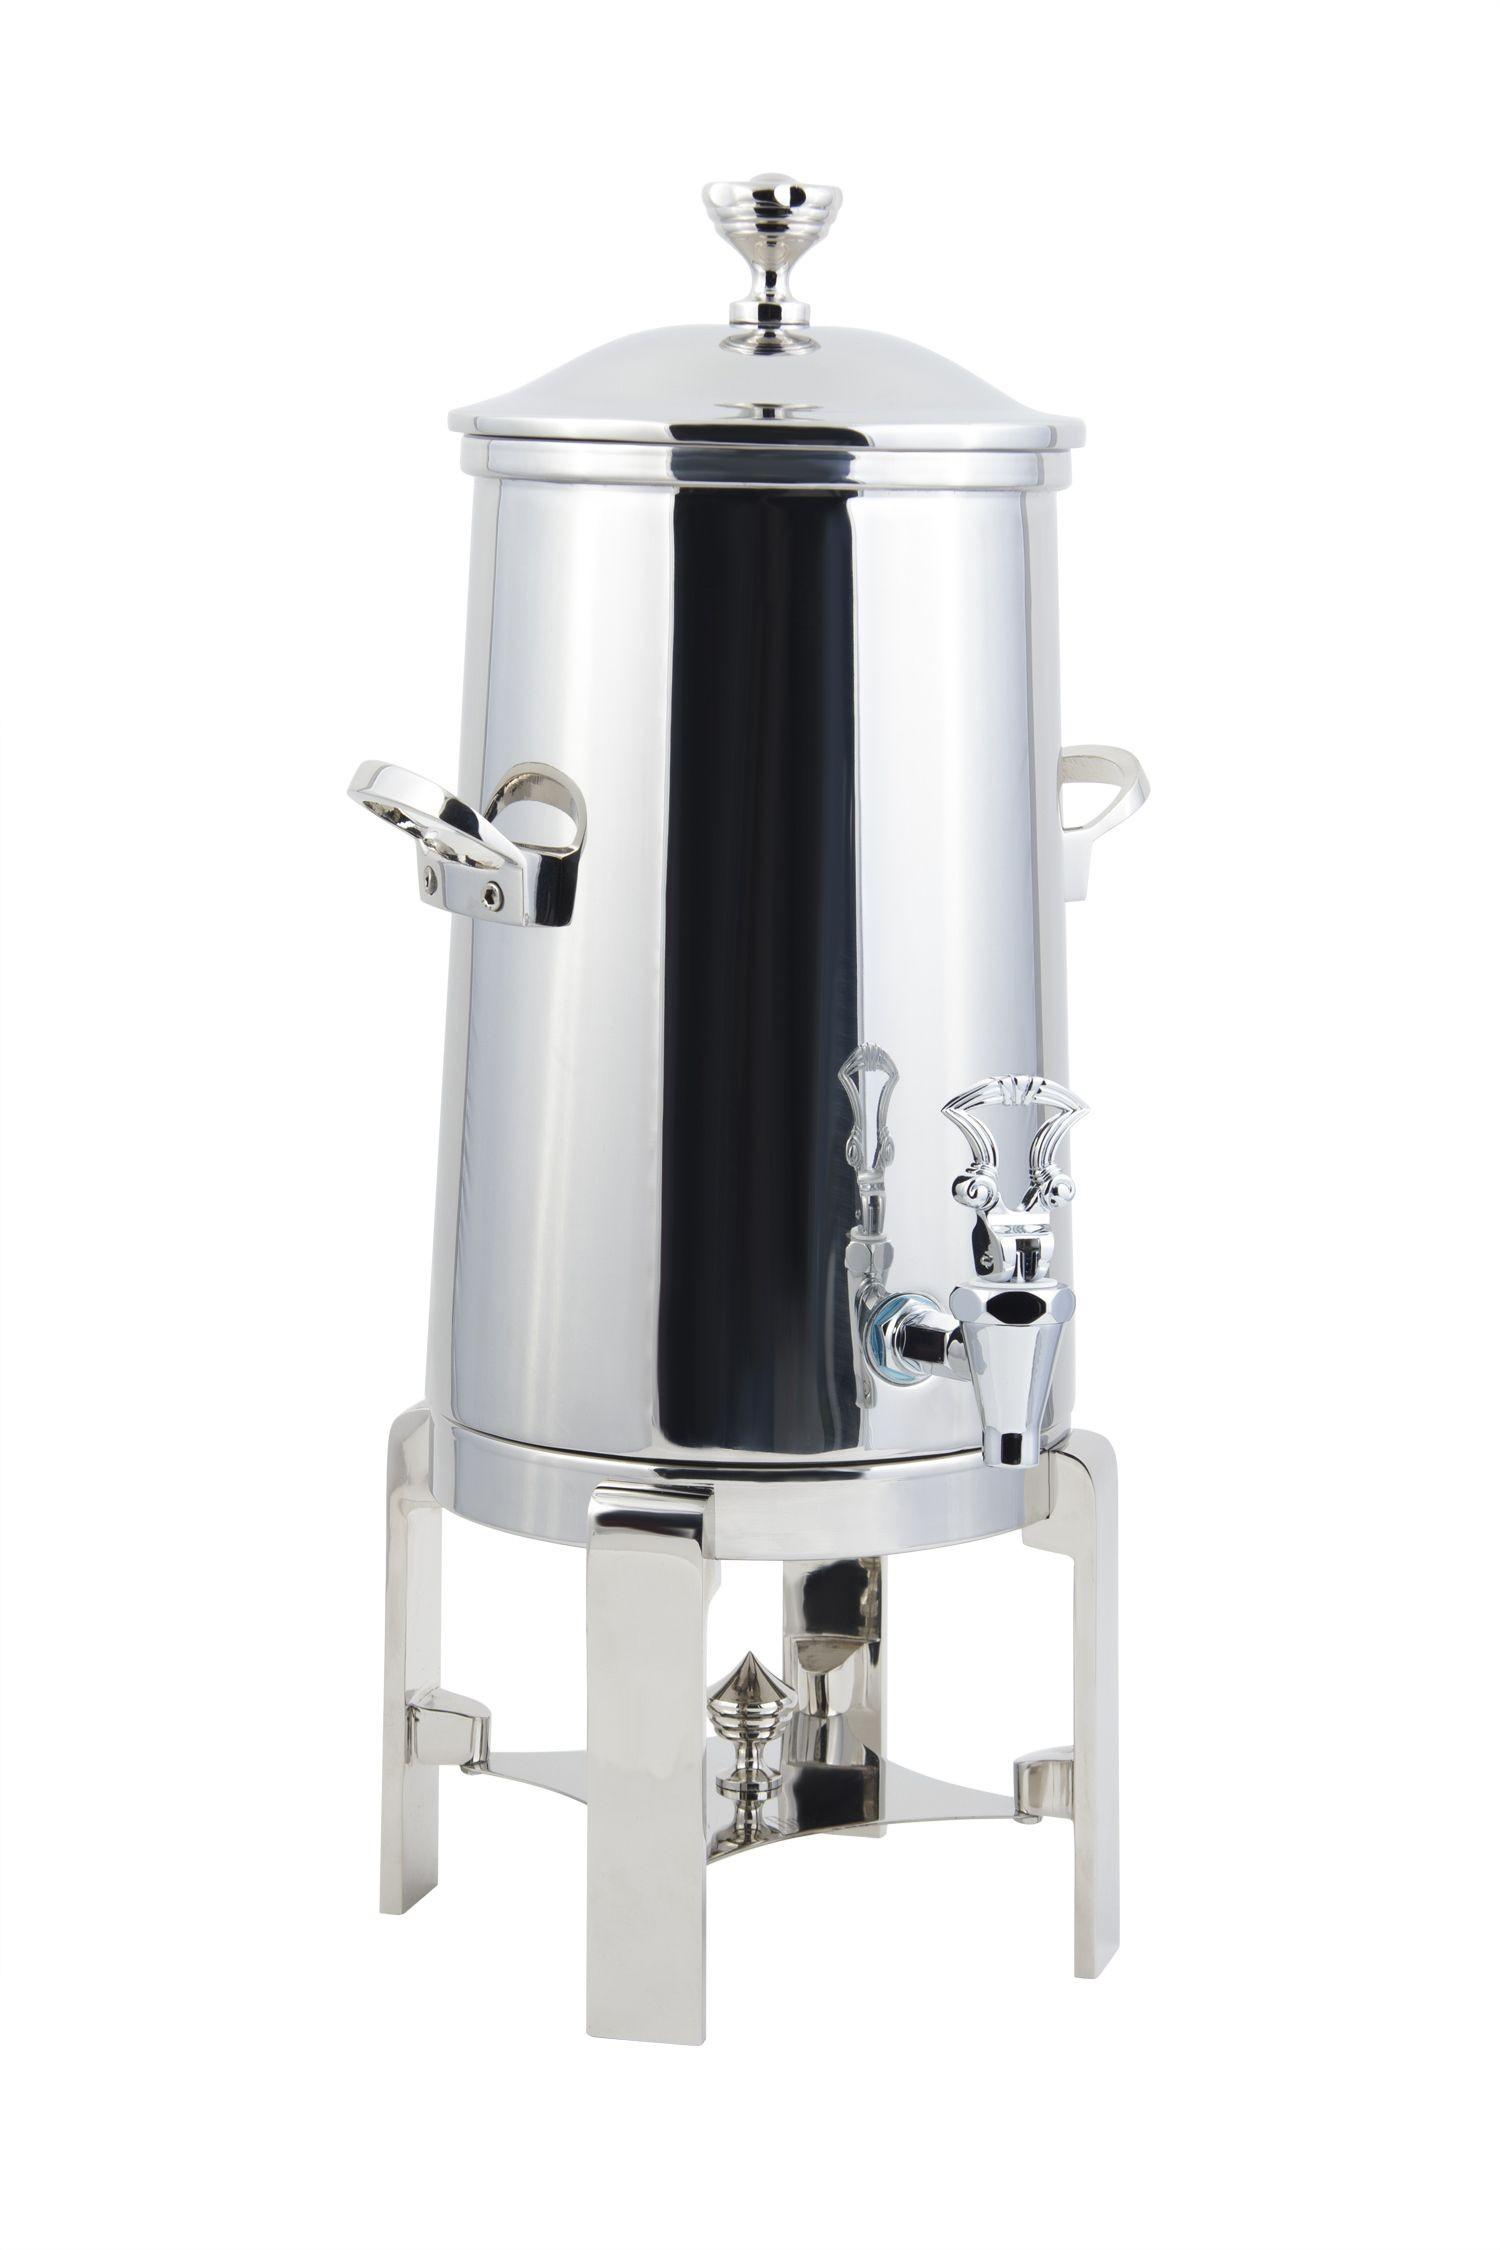 Bon Chef 42003C Contemporary Insulated Coffee Urn with Chrome Trim, 3 Gallon